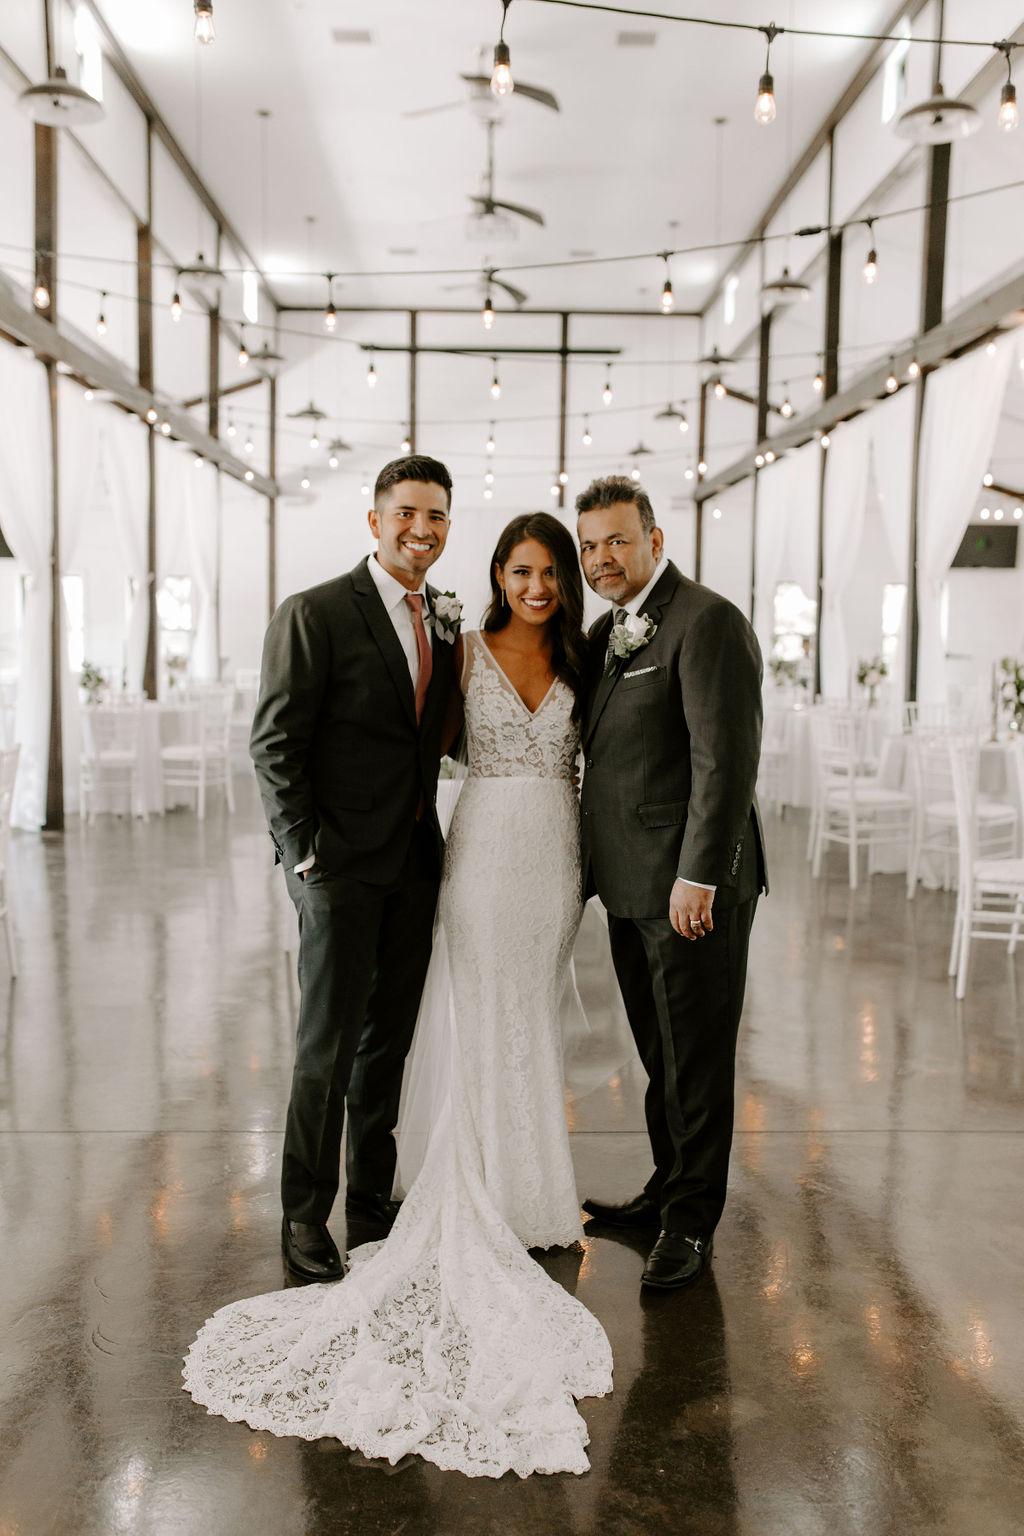 Tulsa White Barn Wedding Venue Outdoor Ceremony 32.jpg